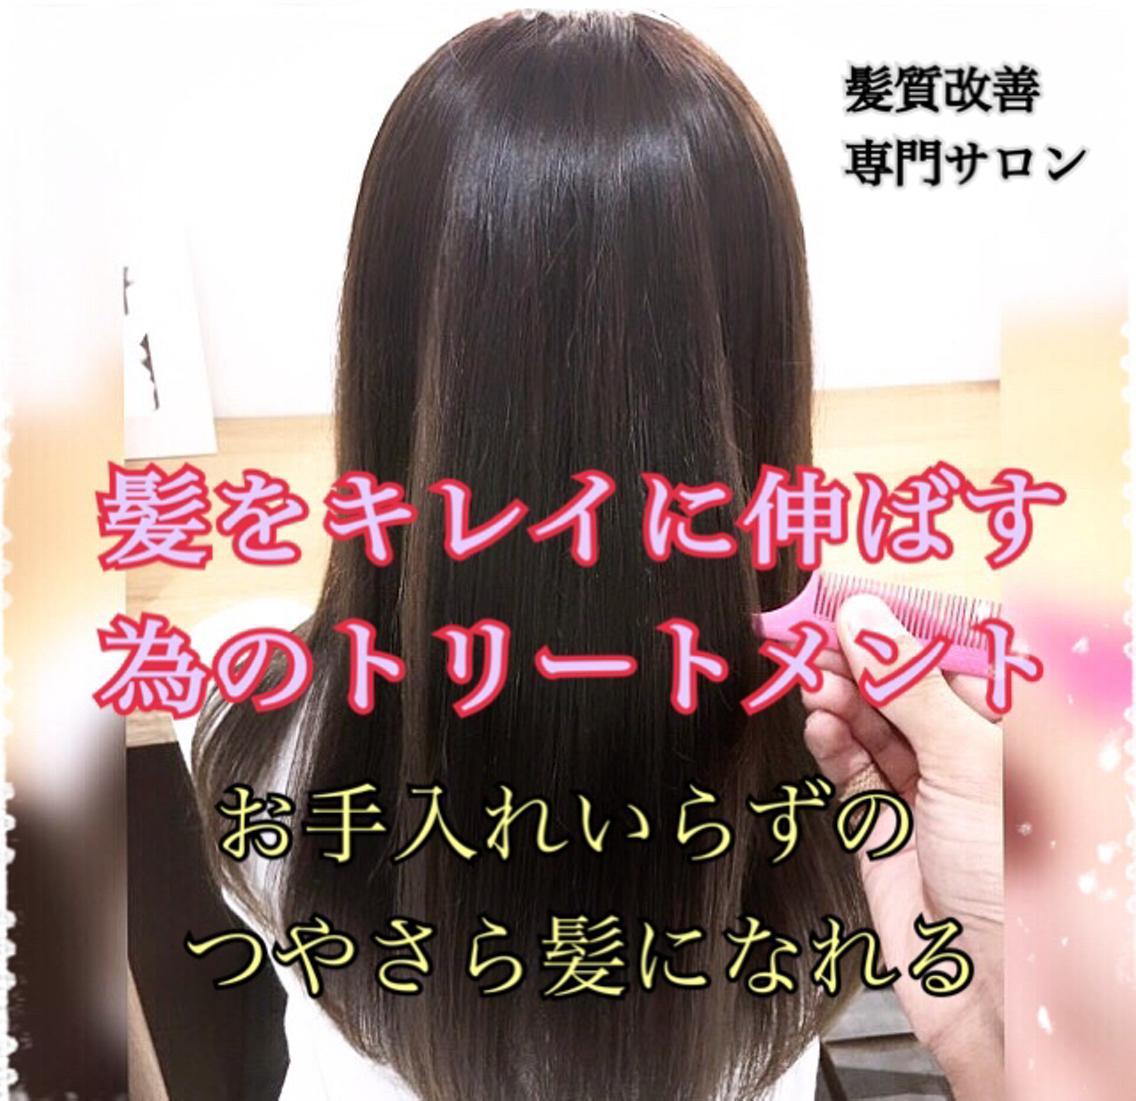 GO TODAY SHAiRE SALON Stella店所属・💫代表髪質改善縮毛矯正KASHIの掲載